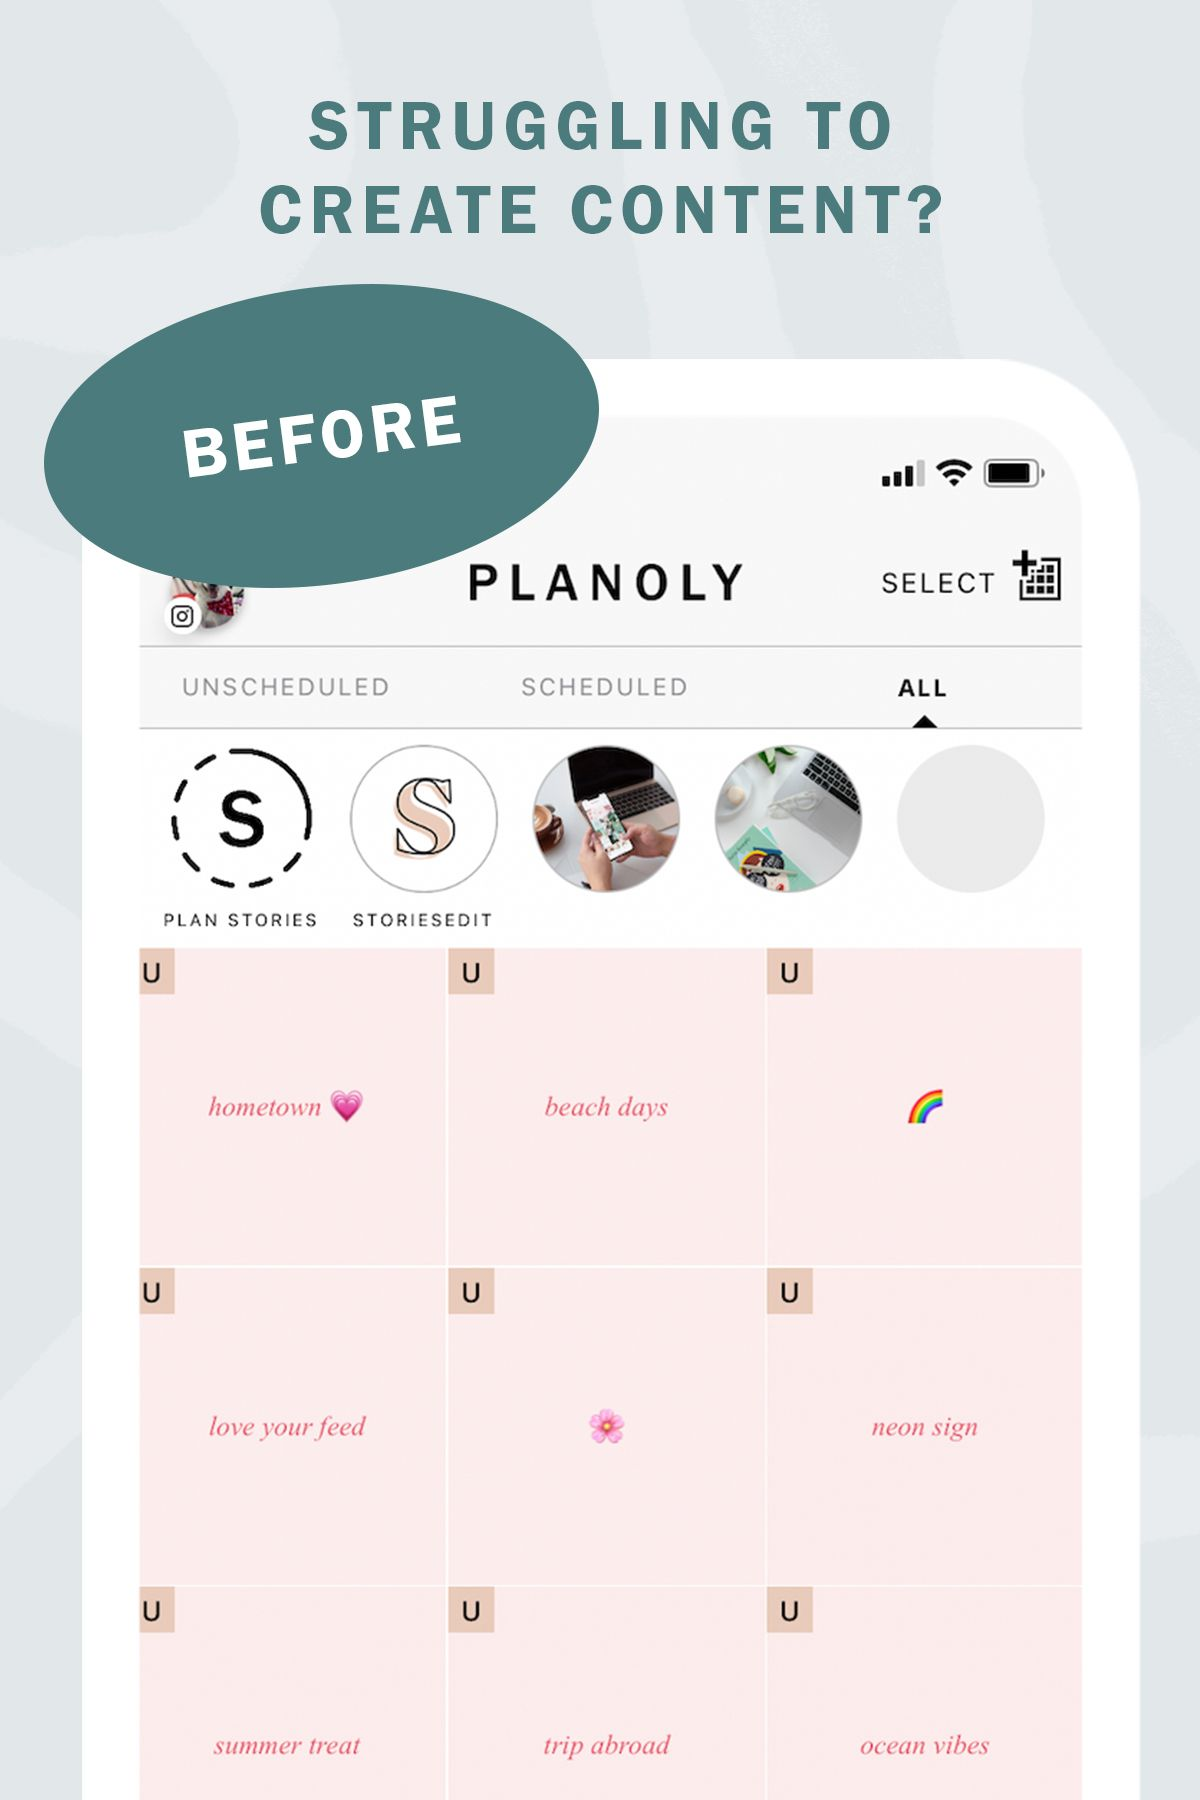 PLANOLY-Canva, Unsplash, Pexels Soft Launch-Blog Img 1-1